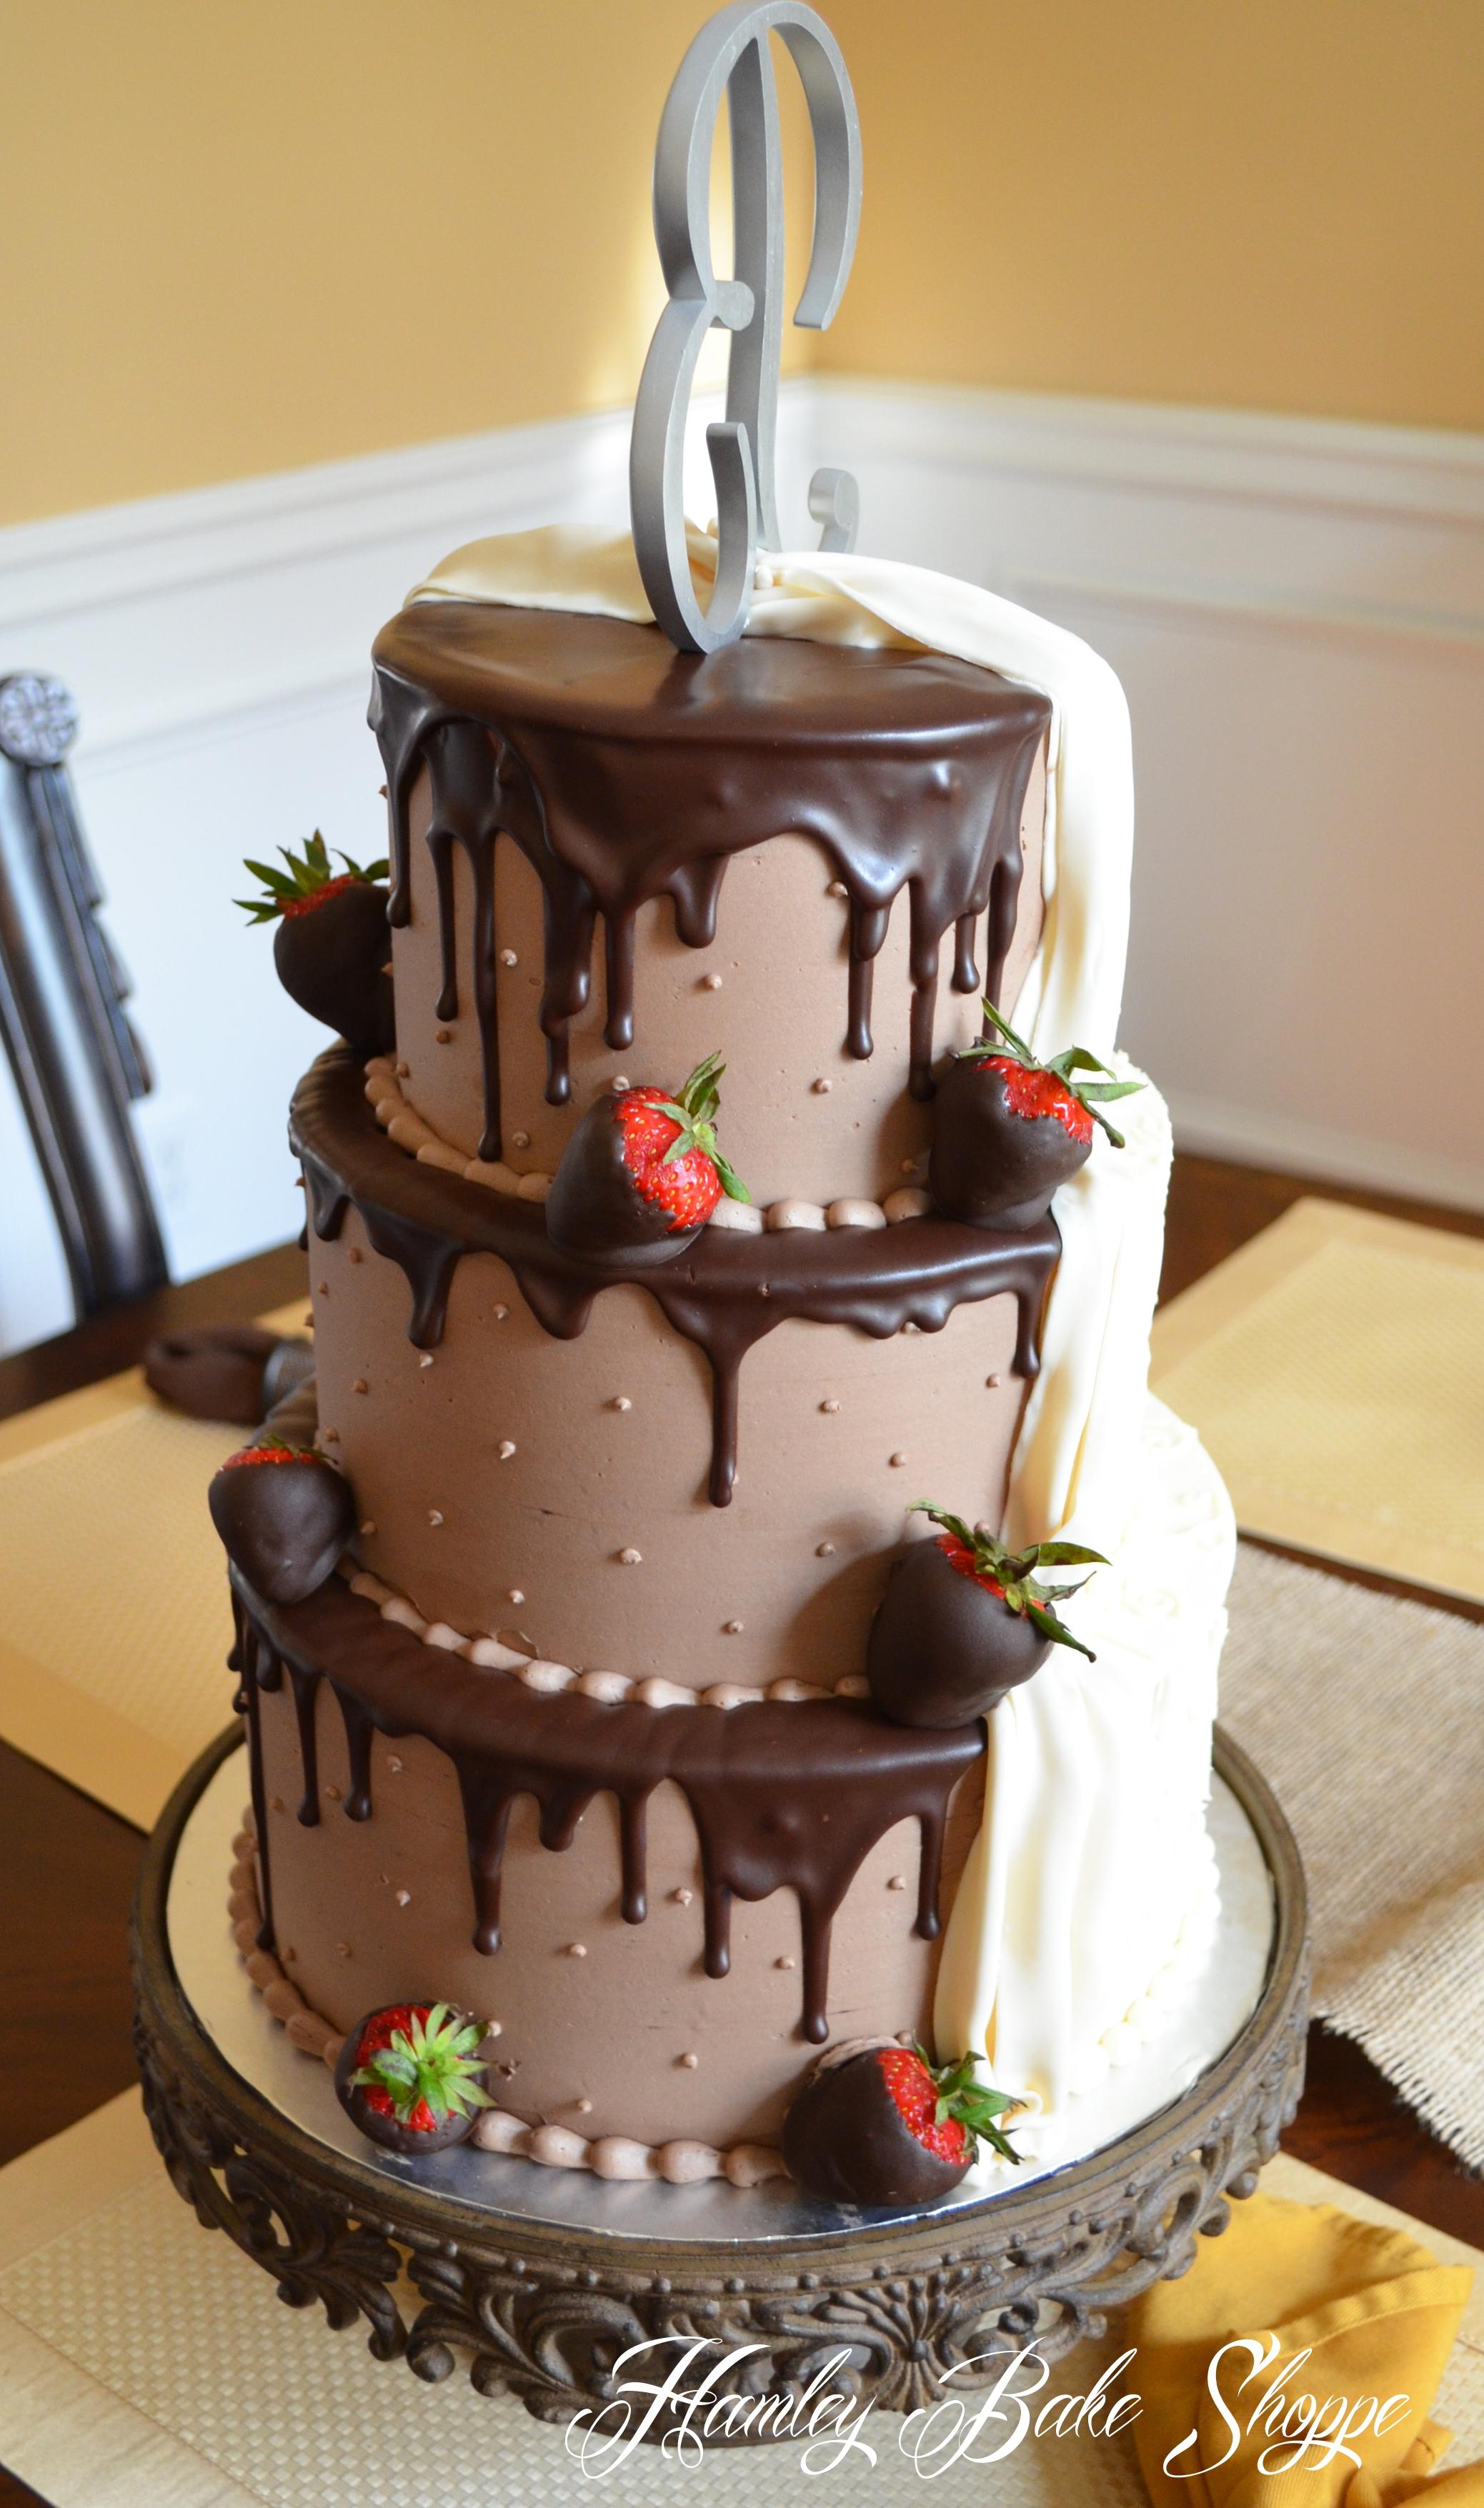 Combined Wedding & Groom's Cake  Cakecentralm. Tire Tread Rings. Raindrop Shaped Wedding Rings. Camo Engagement Rings. Coloured Stone Engagement Rings. Unique Alternative Engagement Wedding Rings. Iridology Rings. 5.3 Carat Engagement Rings. Craft Rings